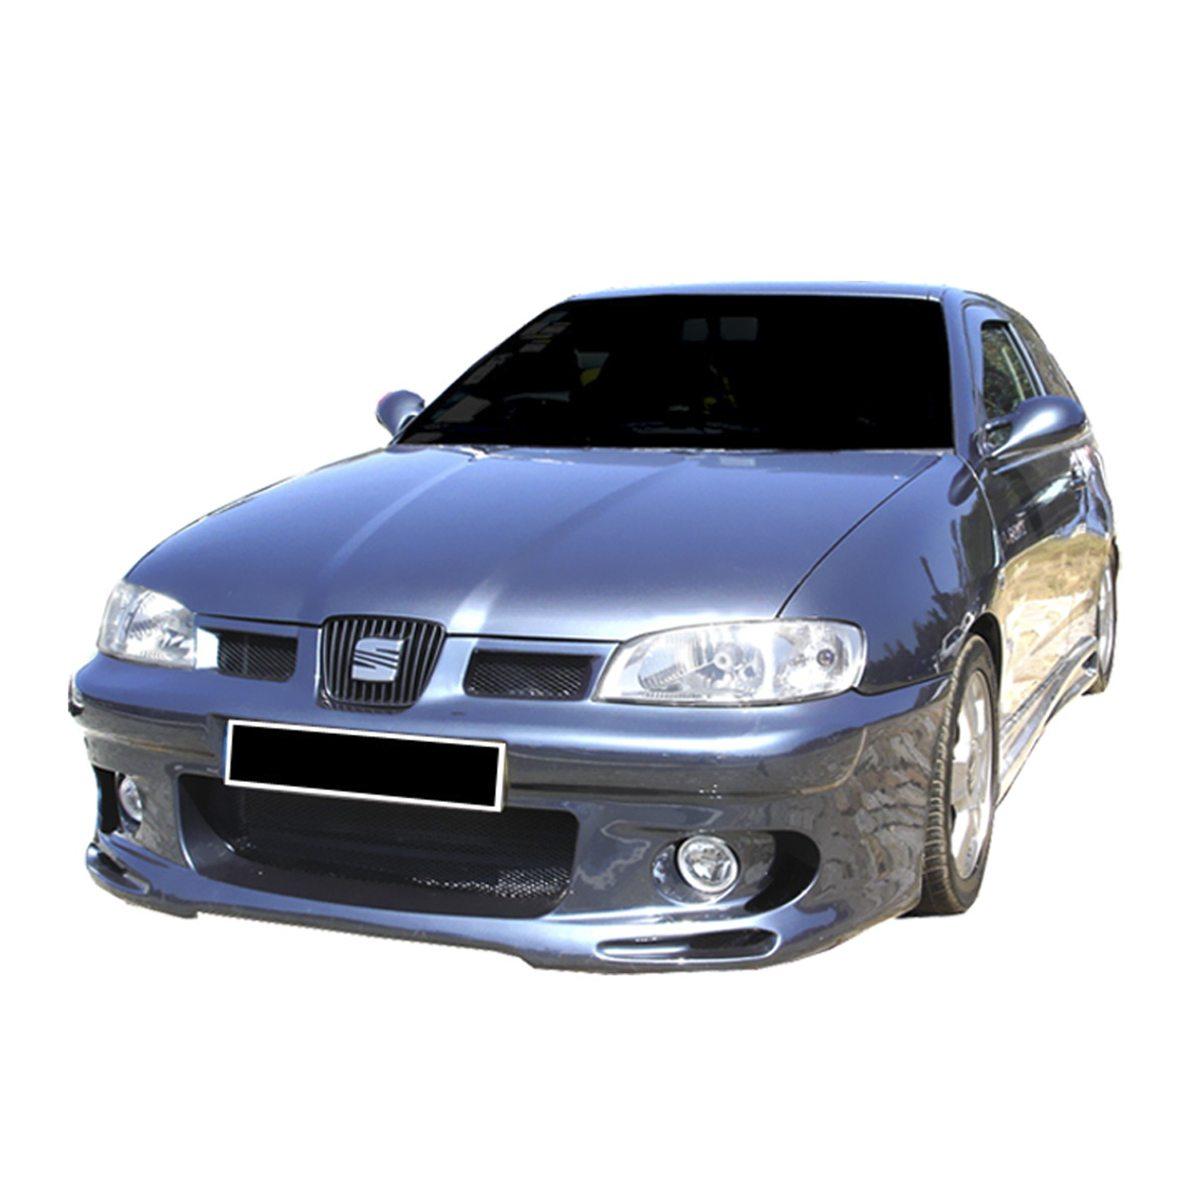 Seat-Ibiza-2000-Shadow-Frt-PCA124